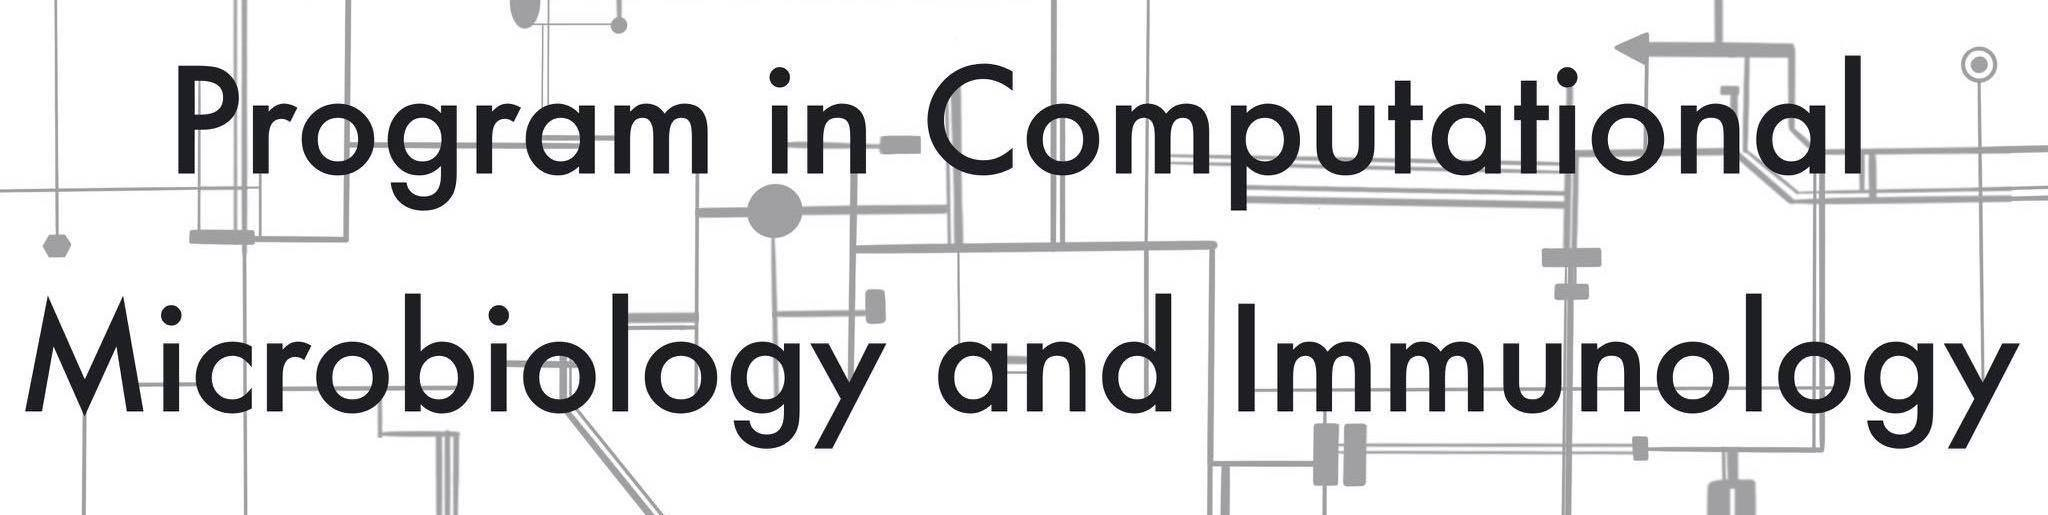 Program in Computational Microbiology